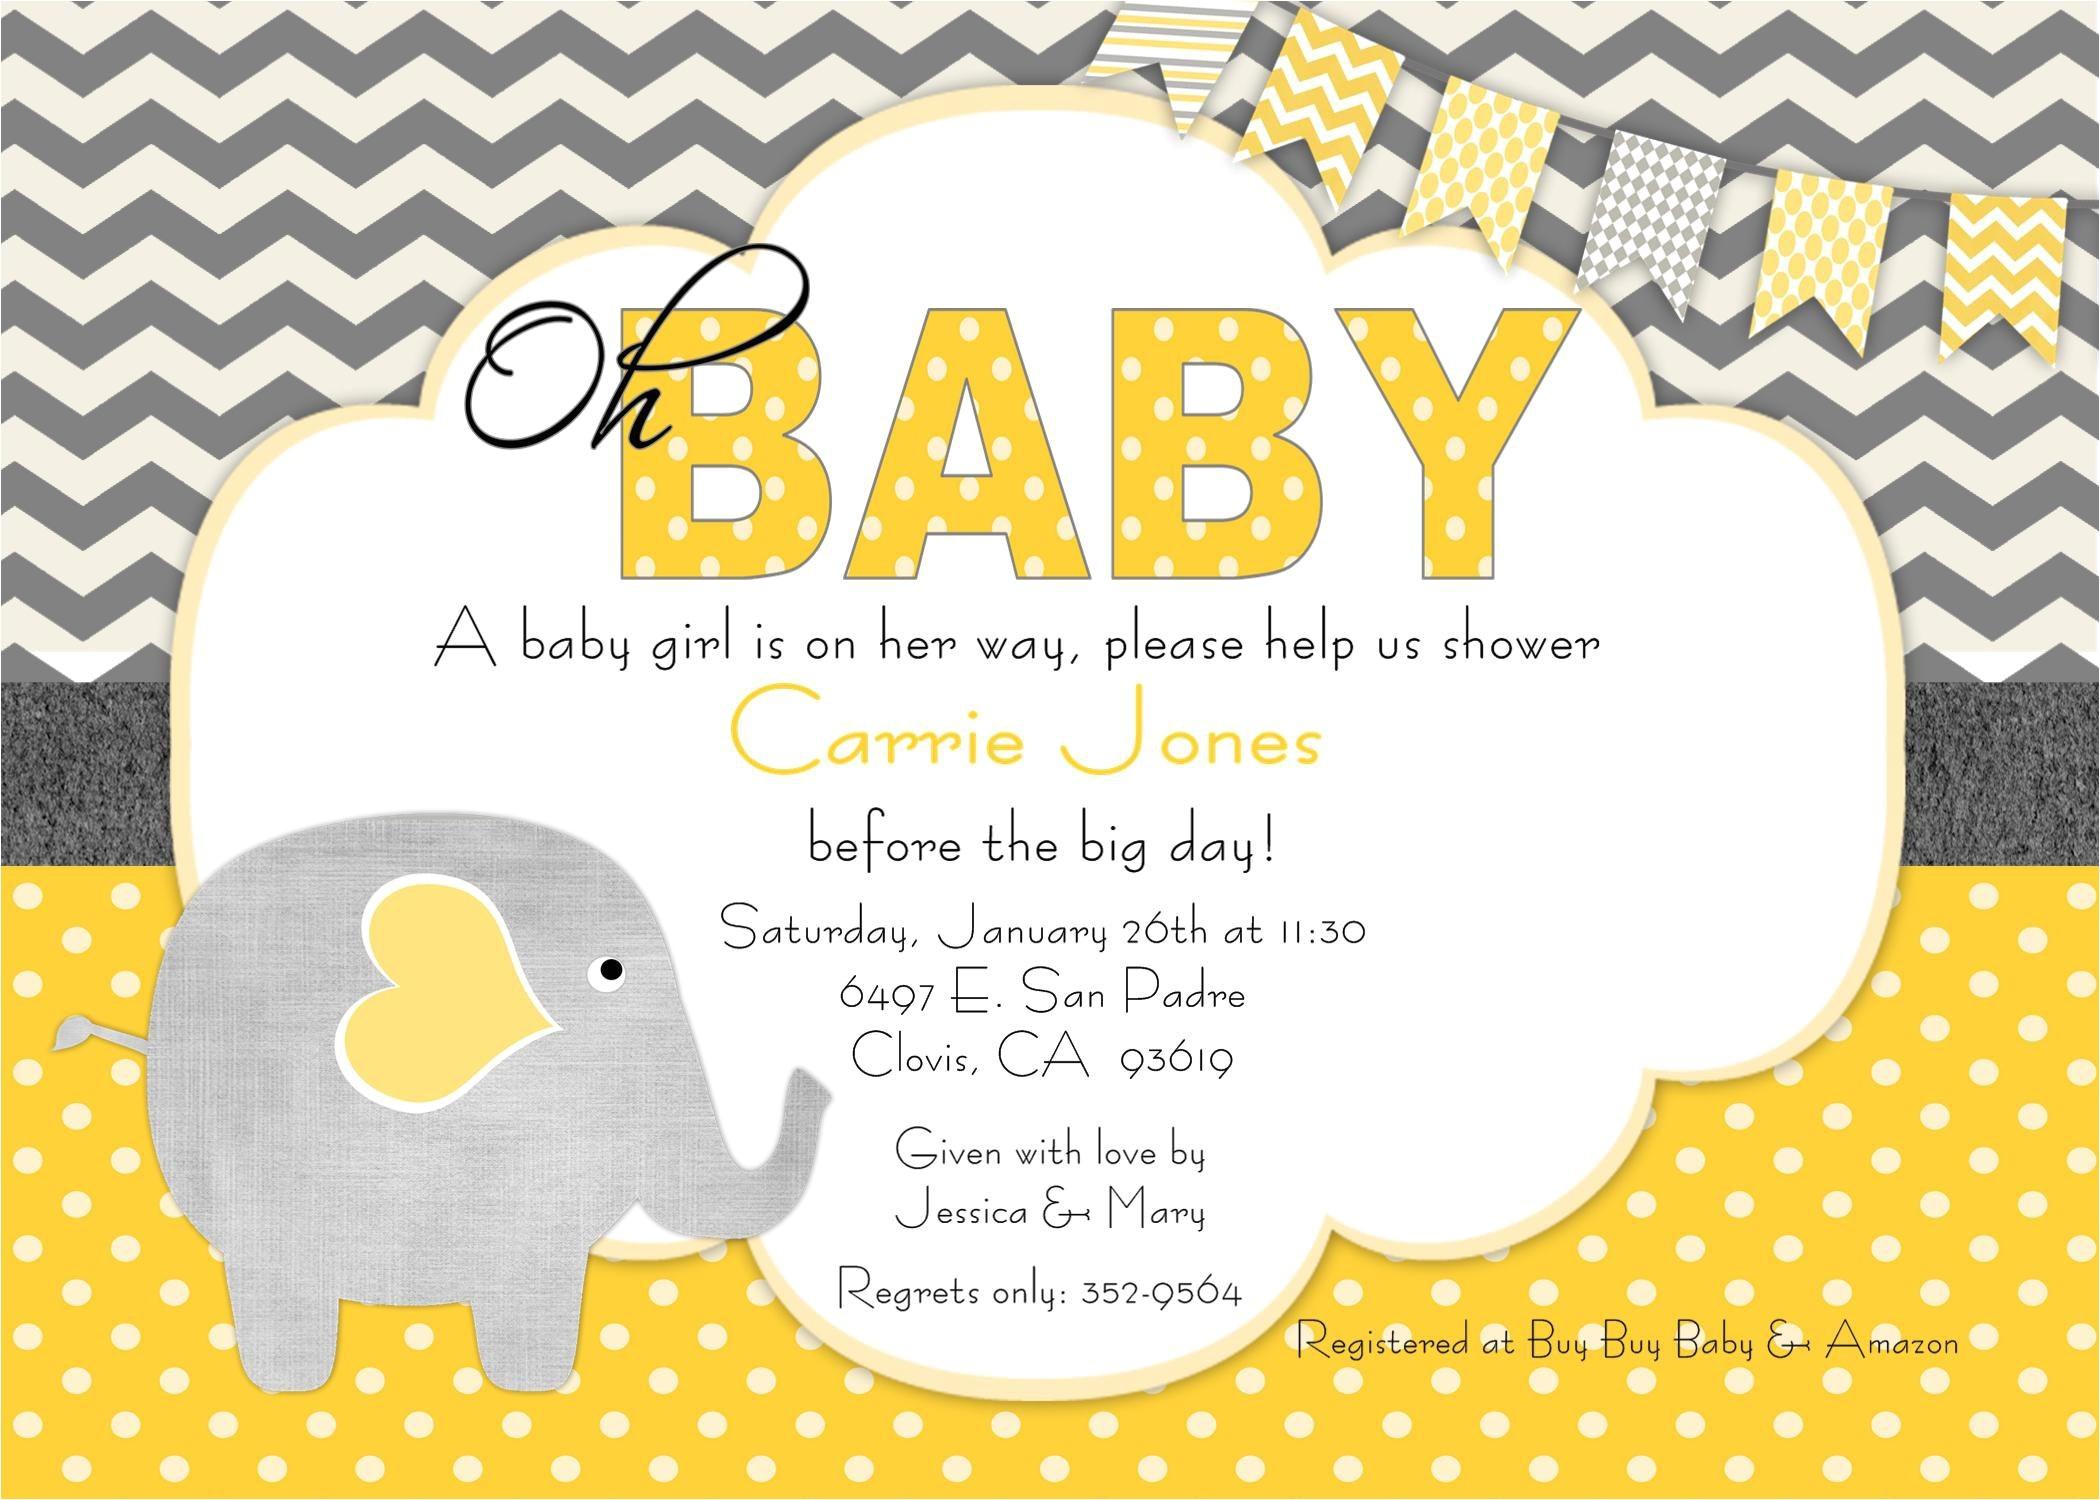 Baby Shower Invitations Evite Baby Shower Invitation Free Baby Shower Invitation